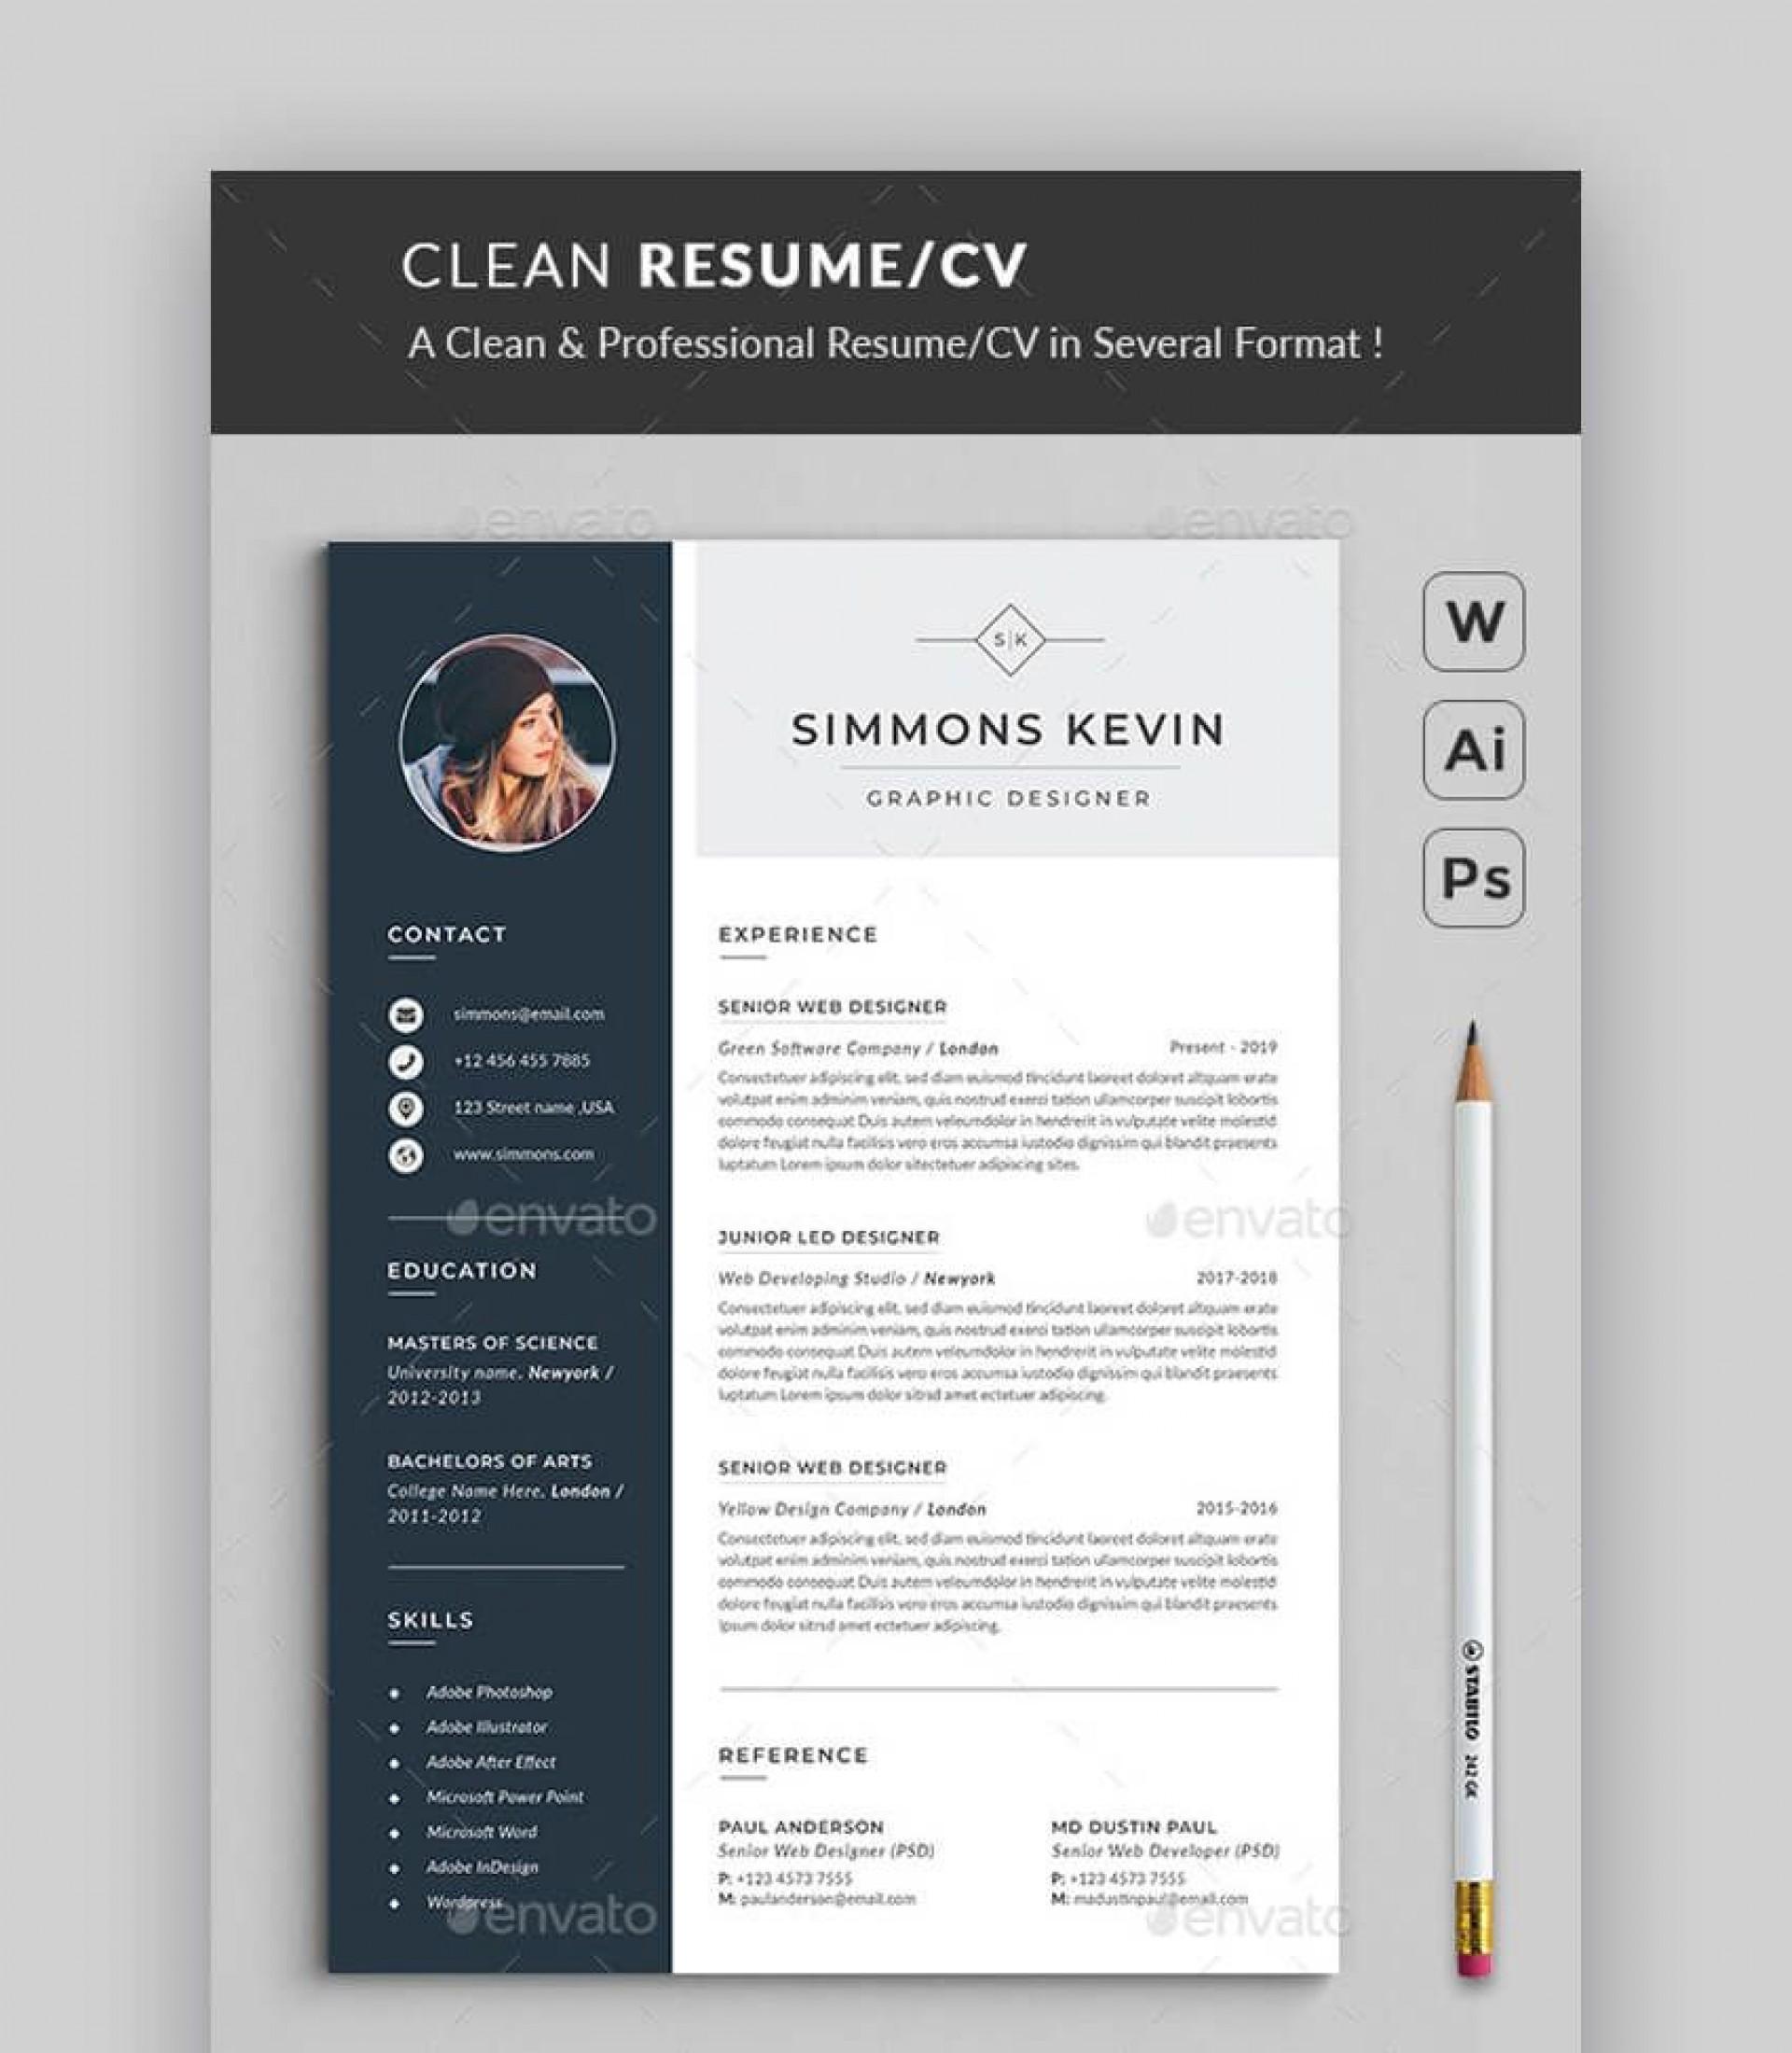 008 Beautiful Free Stylish Resume Template Idea  Templates Word Download1920